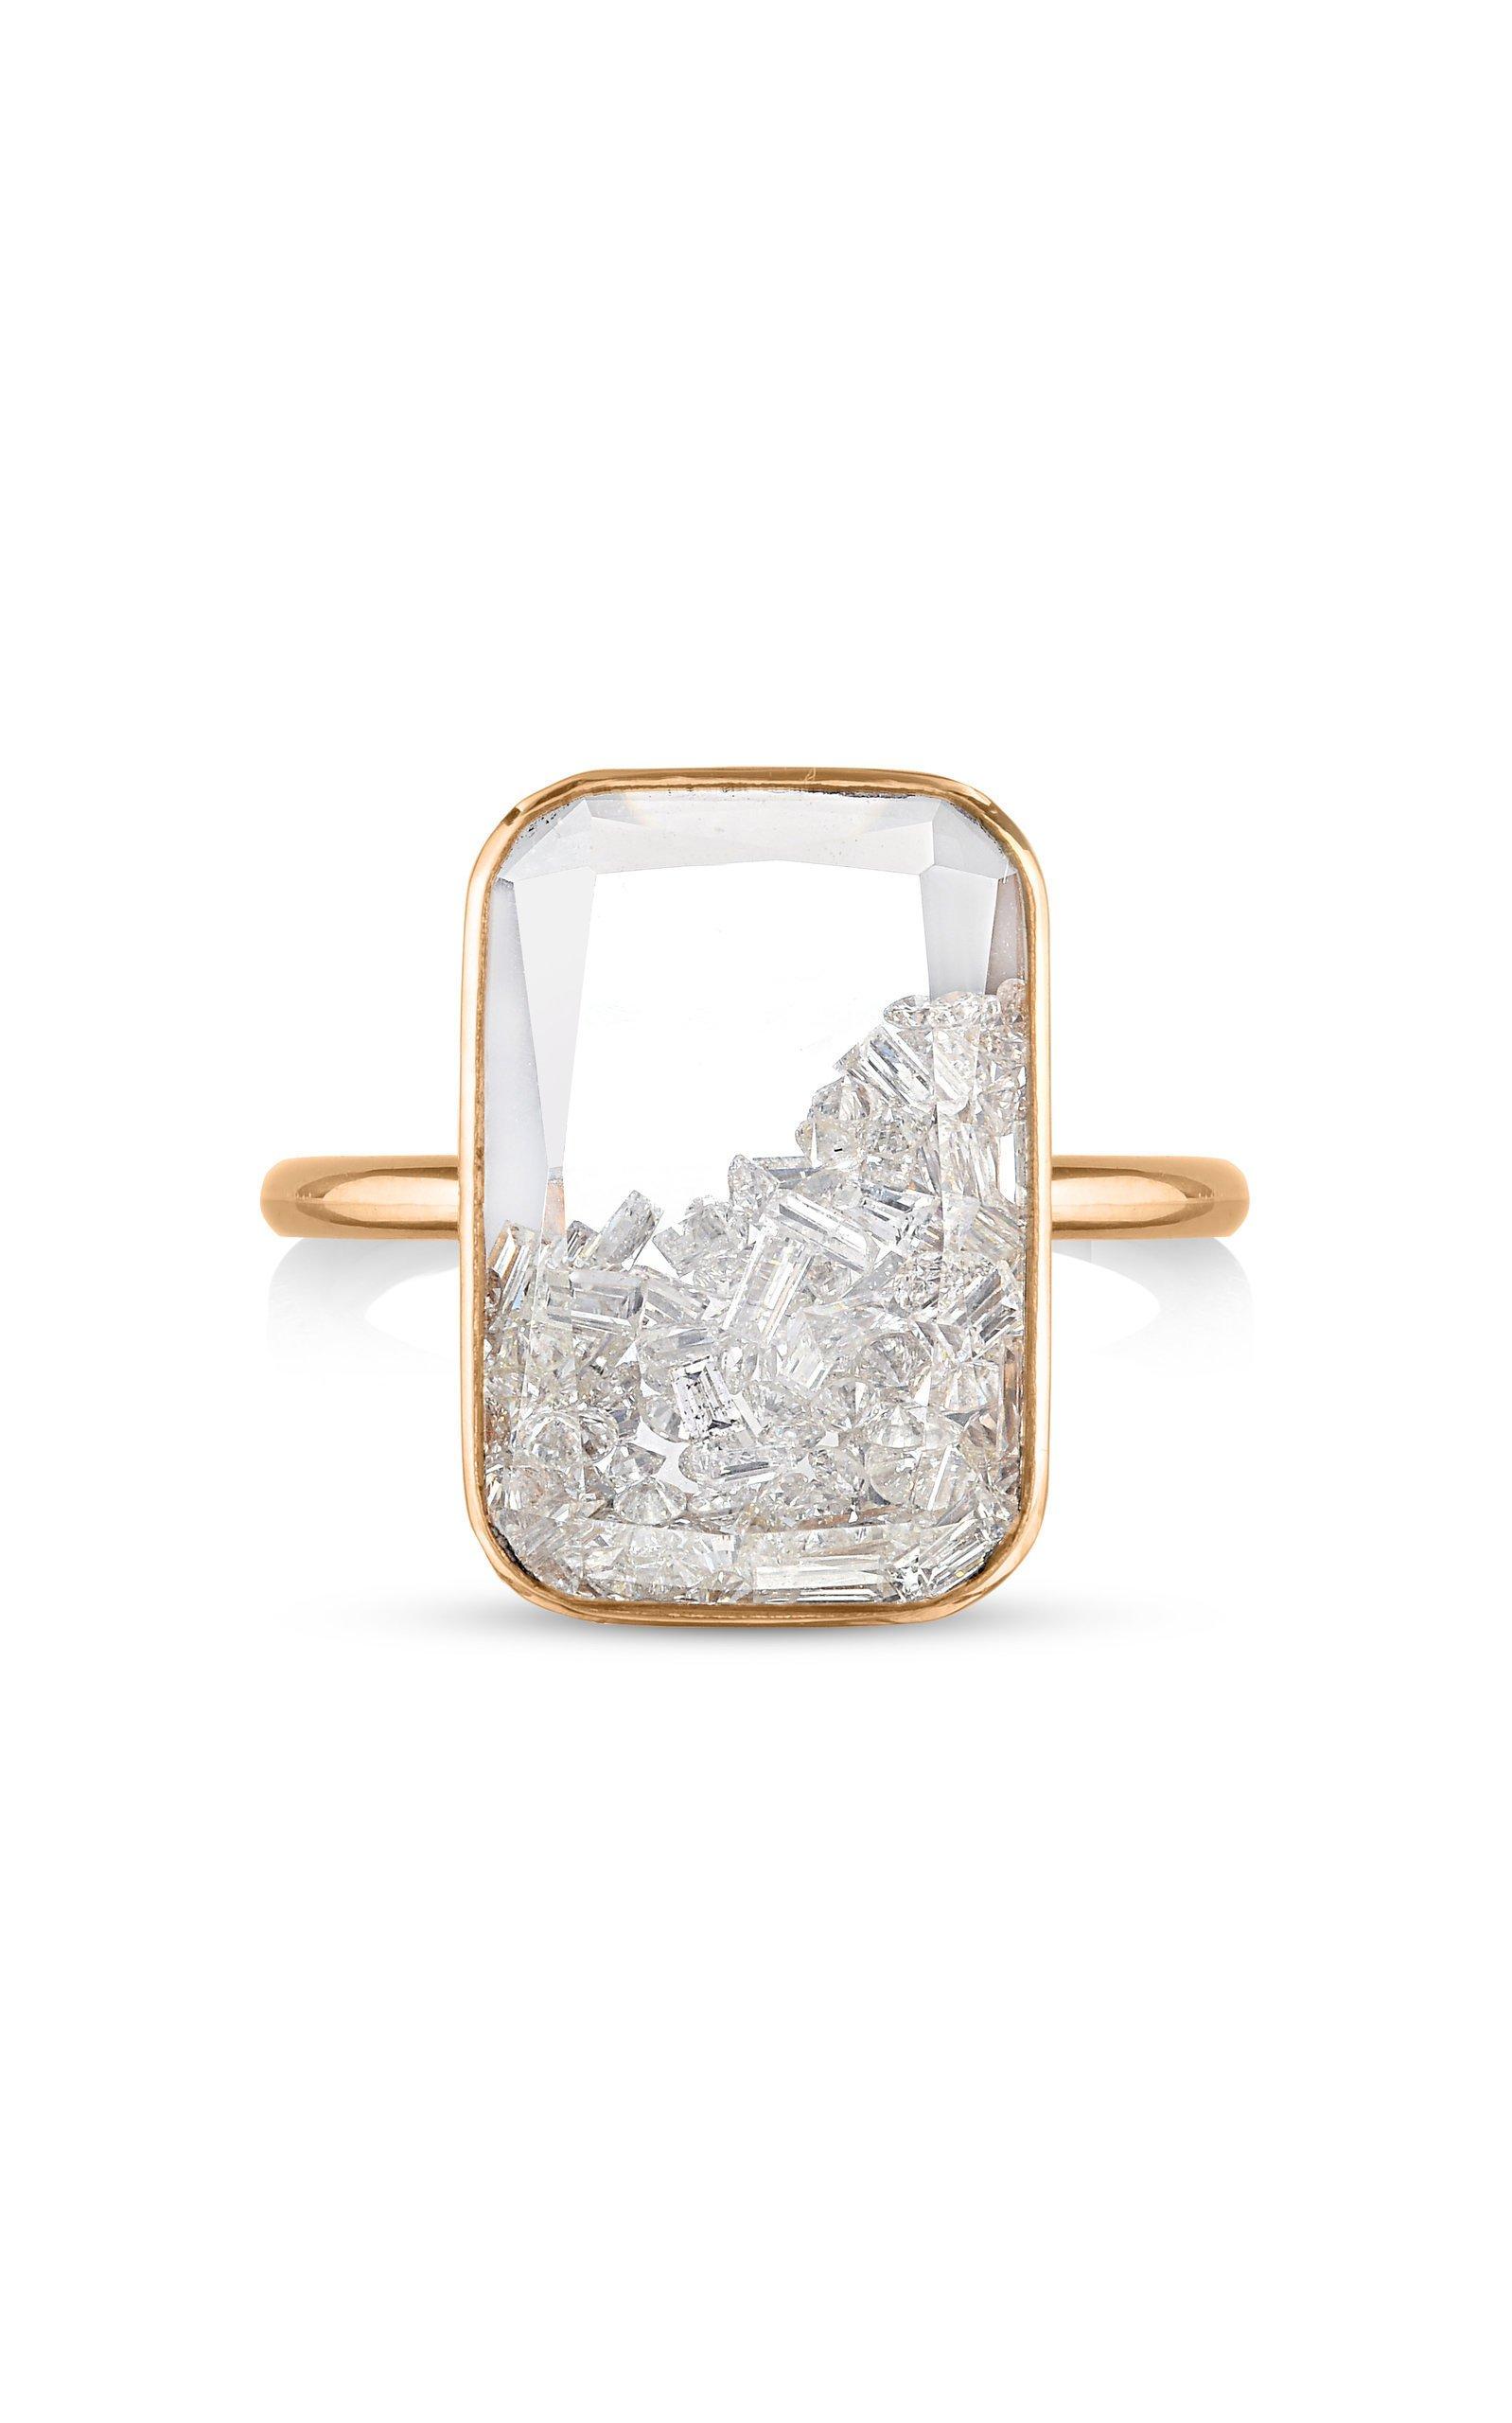 Moritz Glik Diamond Kaleidoscope Shaker Ring